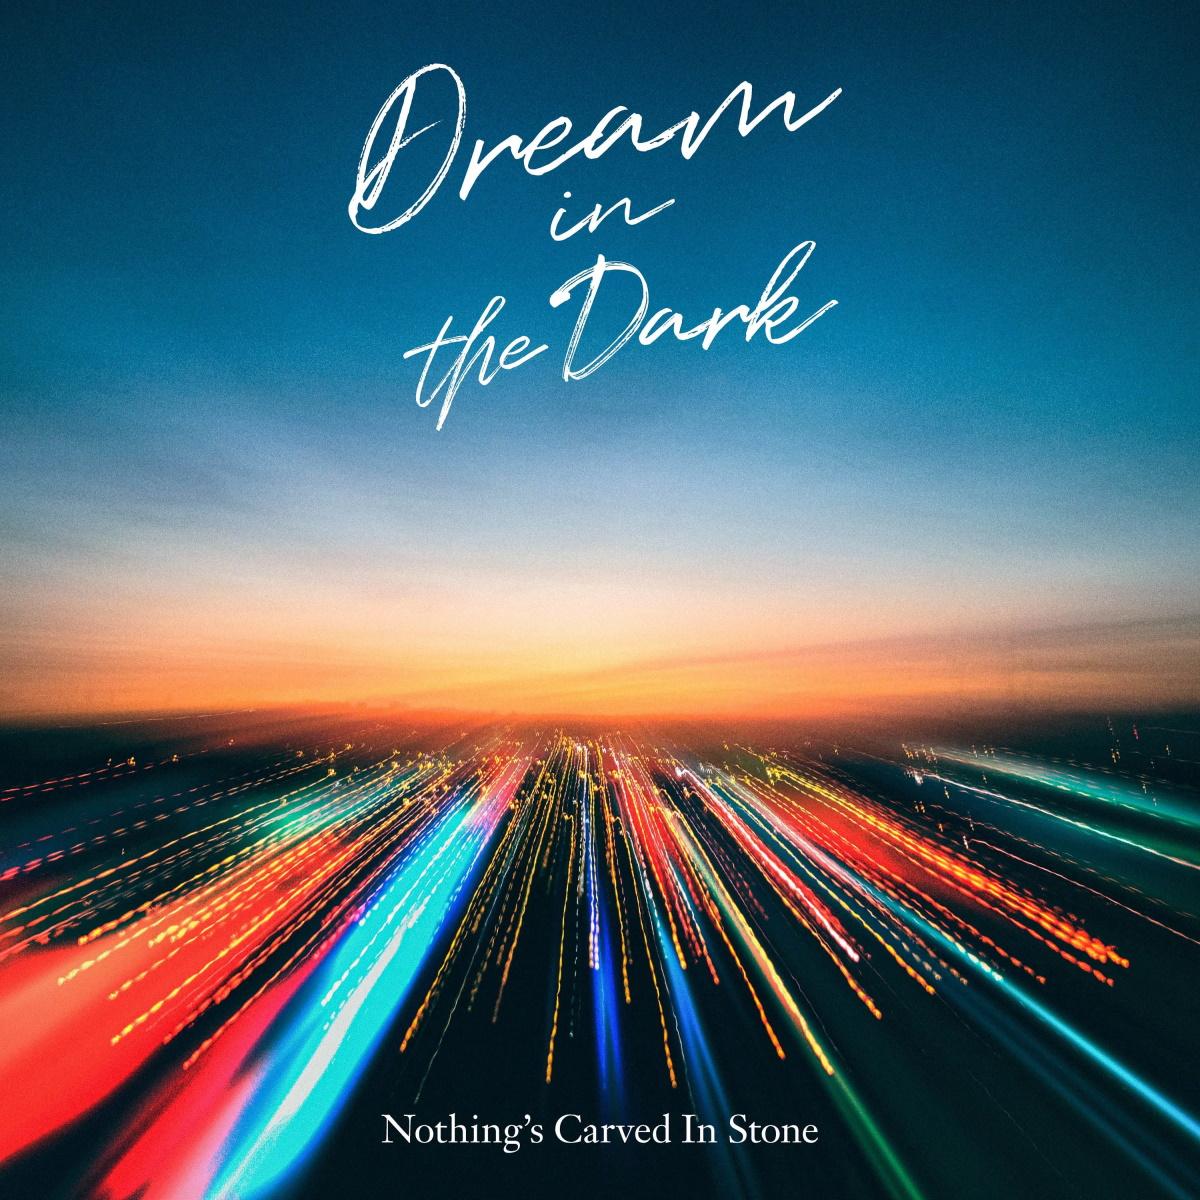 『Nothing's Carved in Stone Dream in the Dark 歌詞』収録の『Dream in the Dark』ジャケット